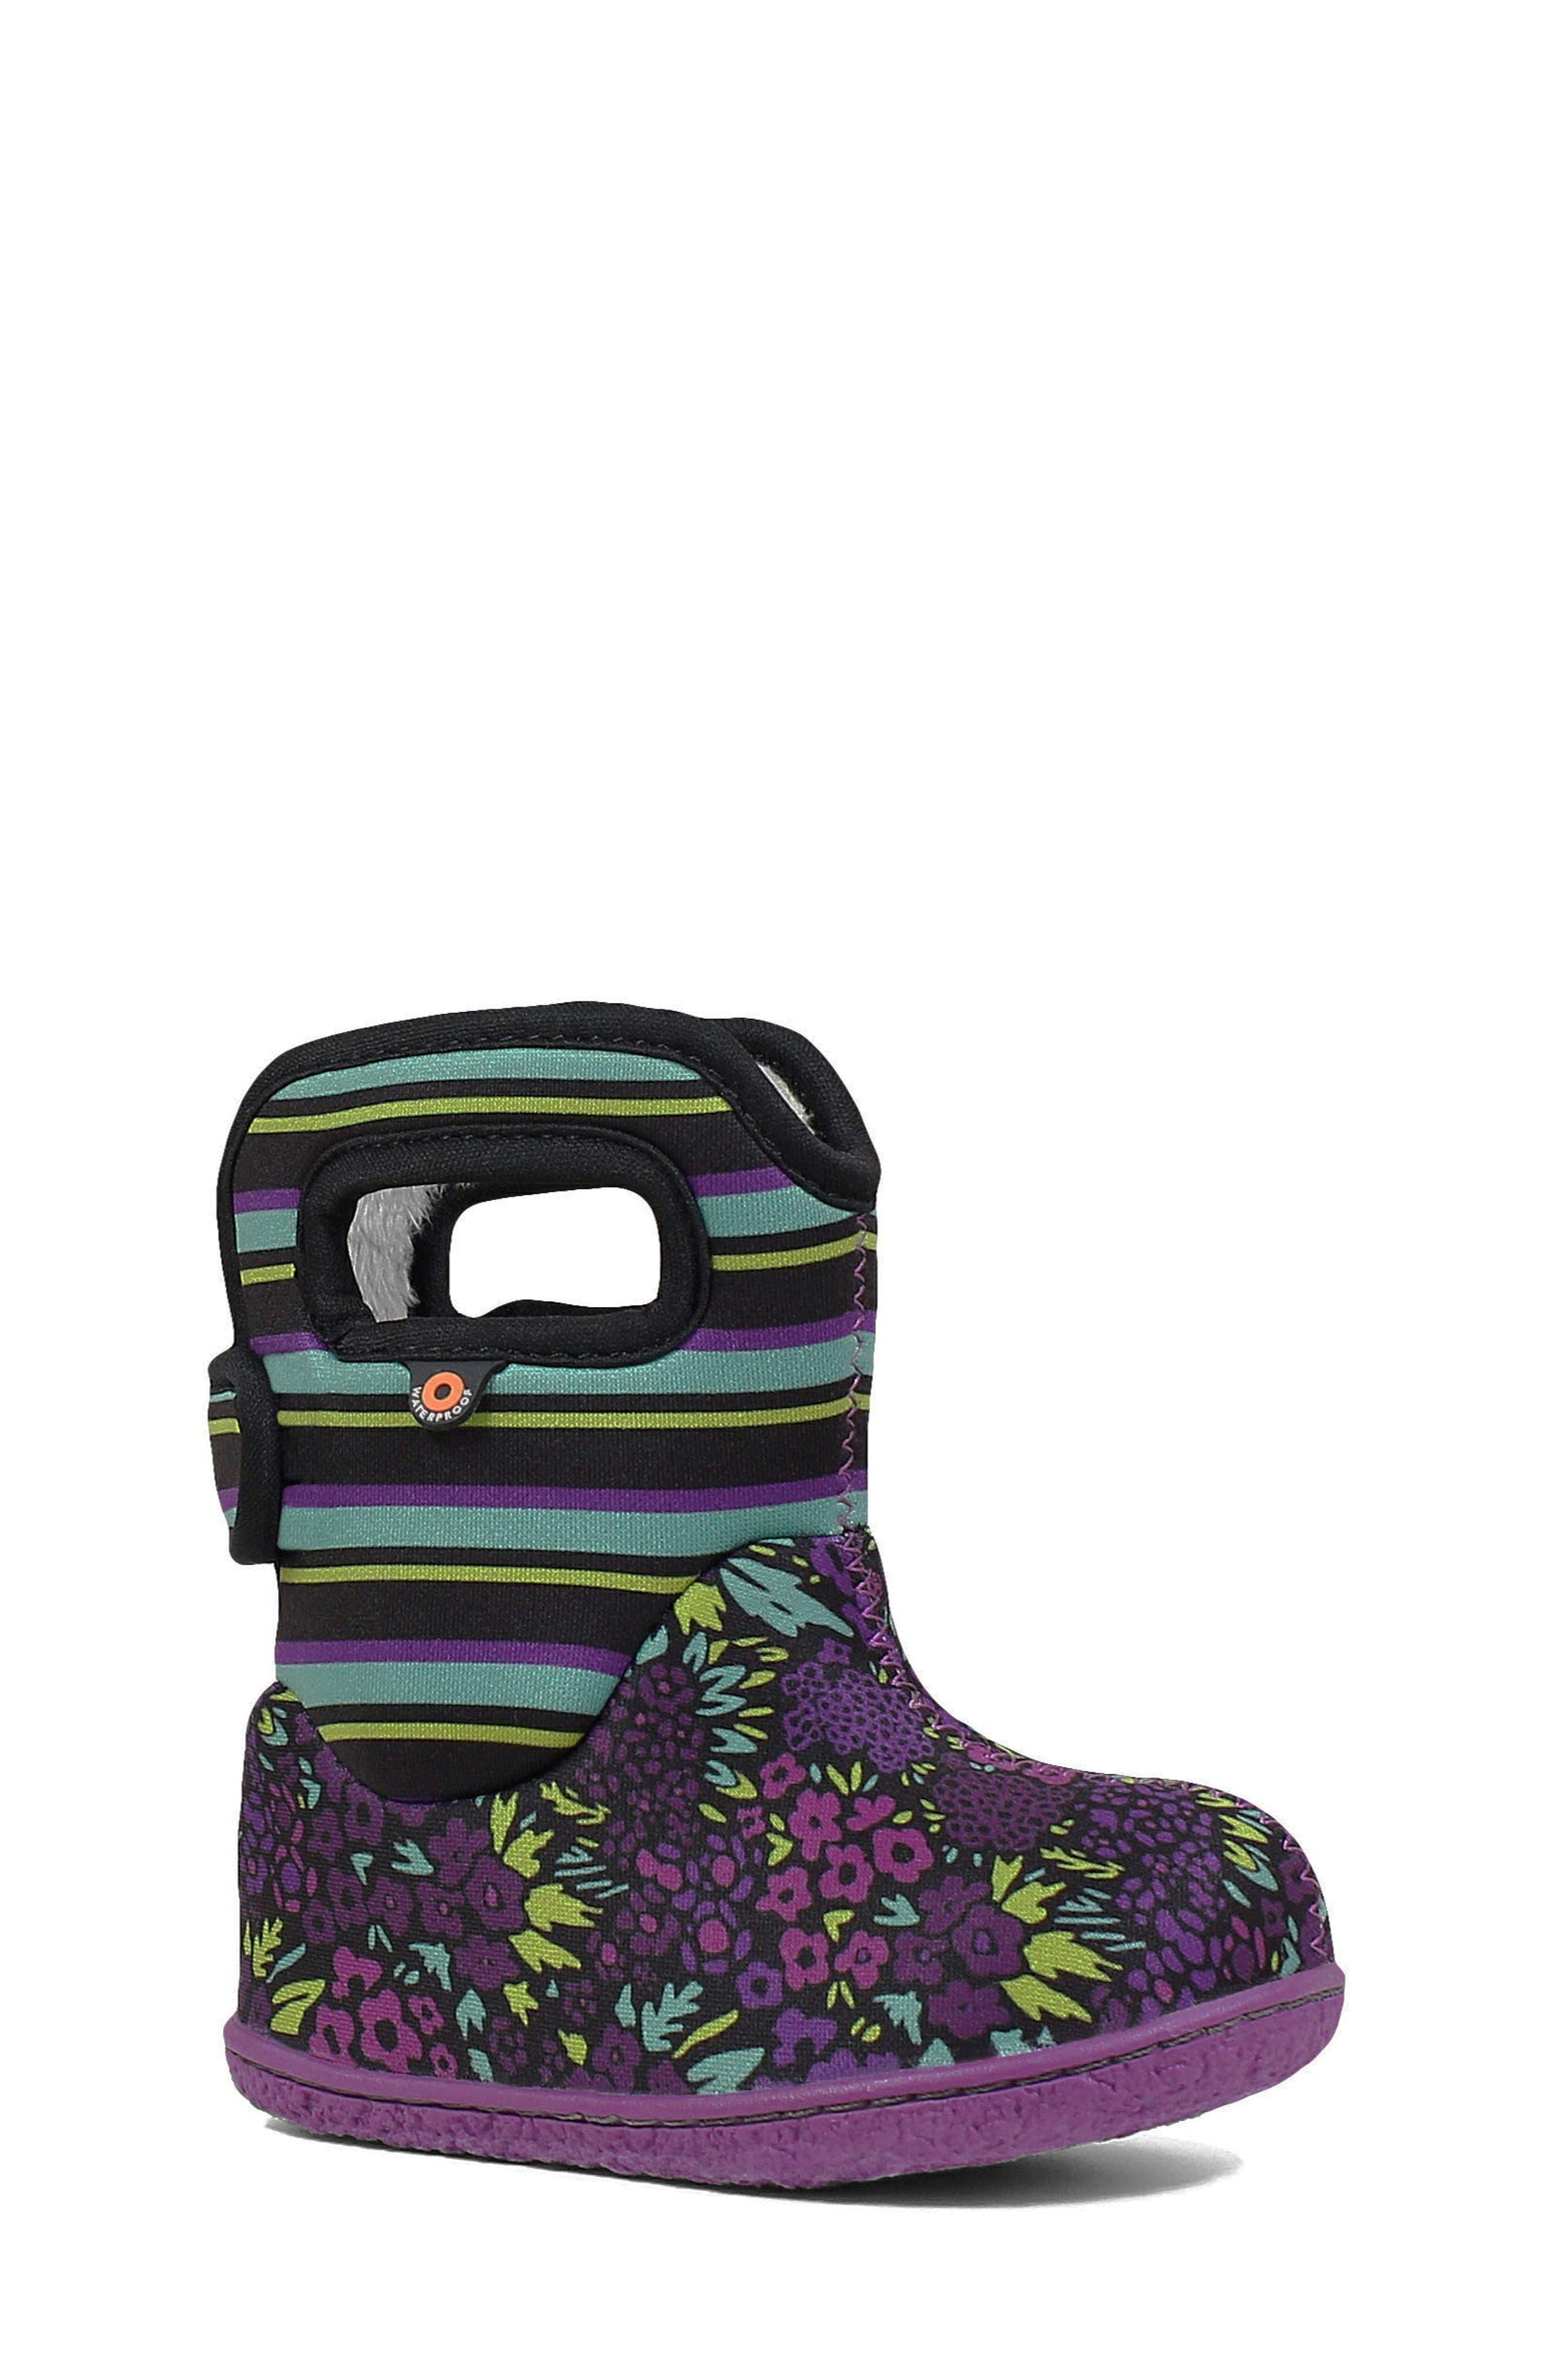 Bogs Toddler Girl's Bogs Baby Bogs Garden Insulated Waterproof Boot, Size 10 M - Black